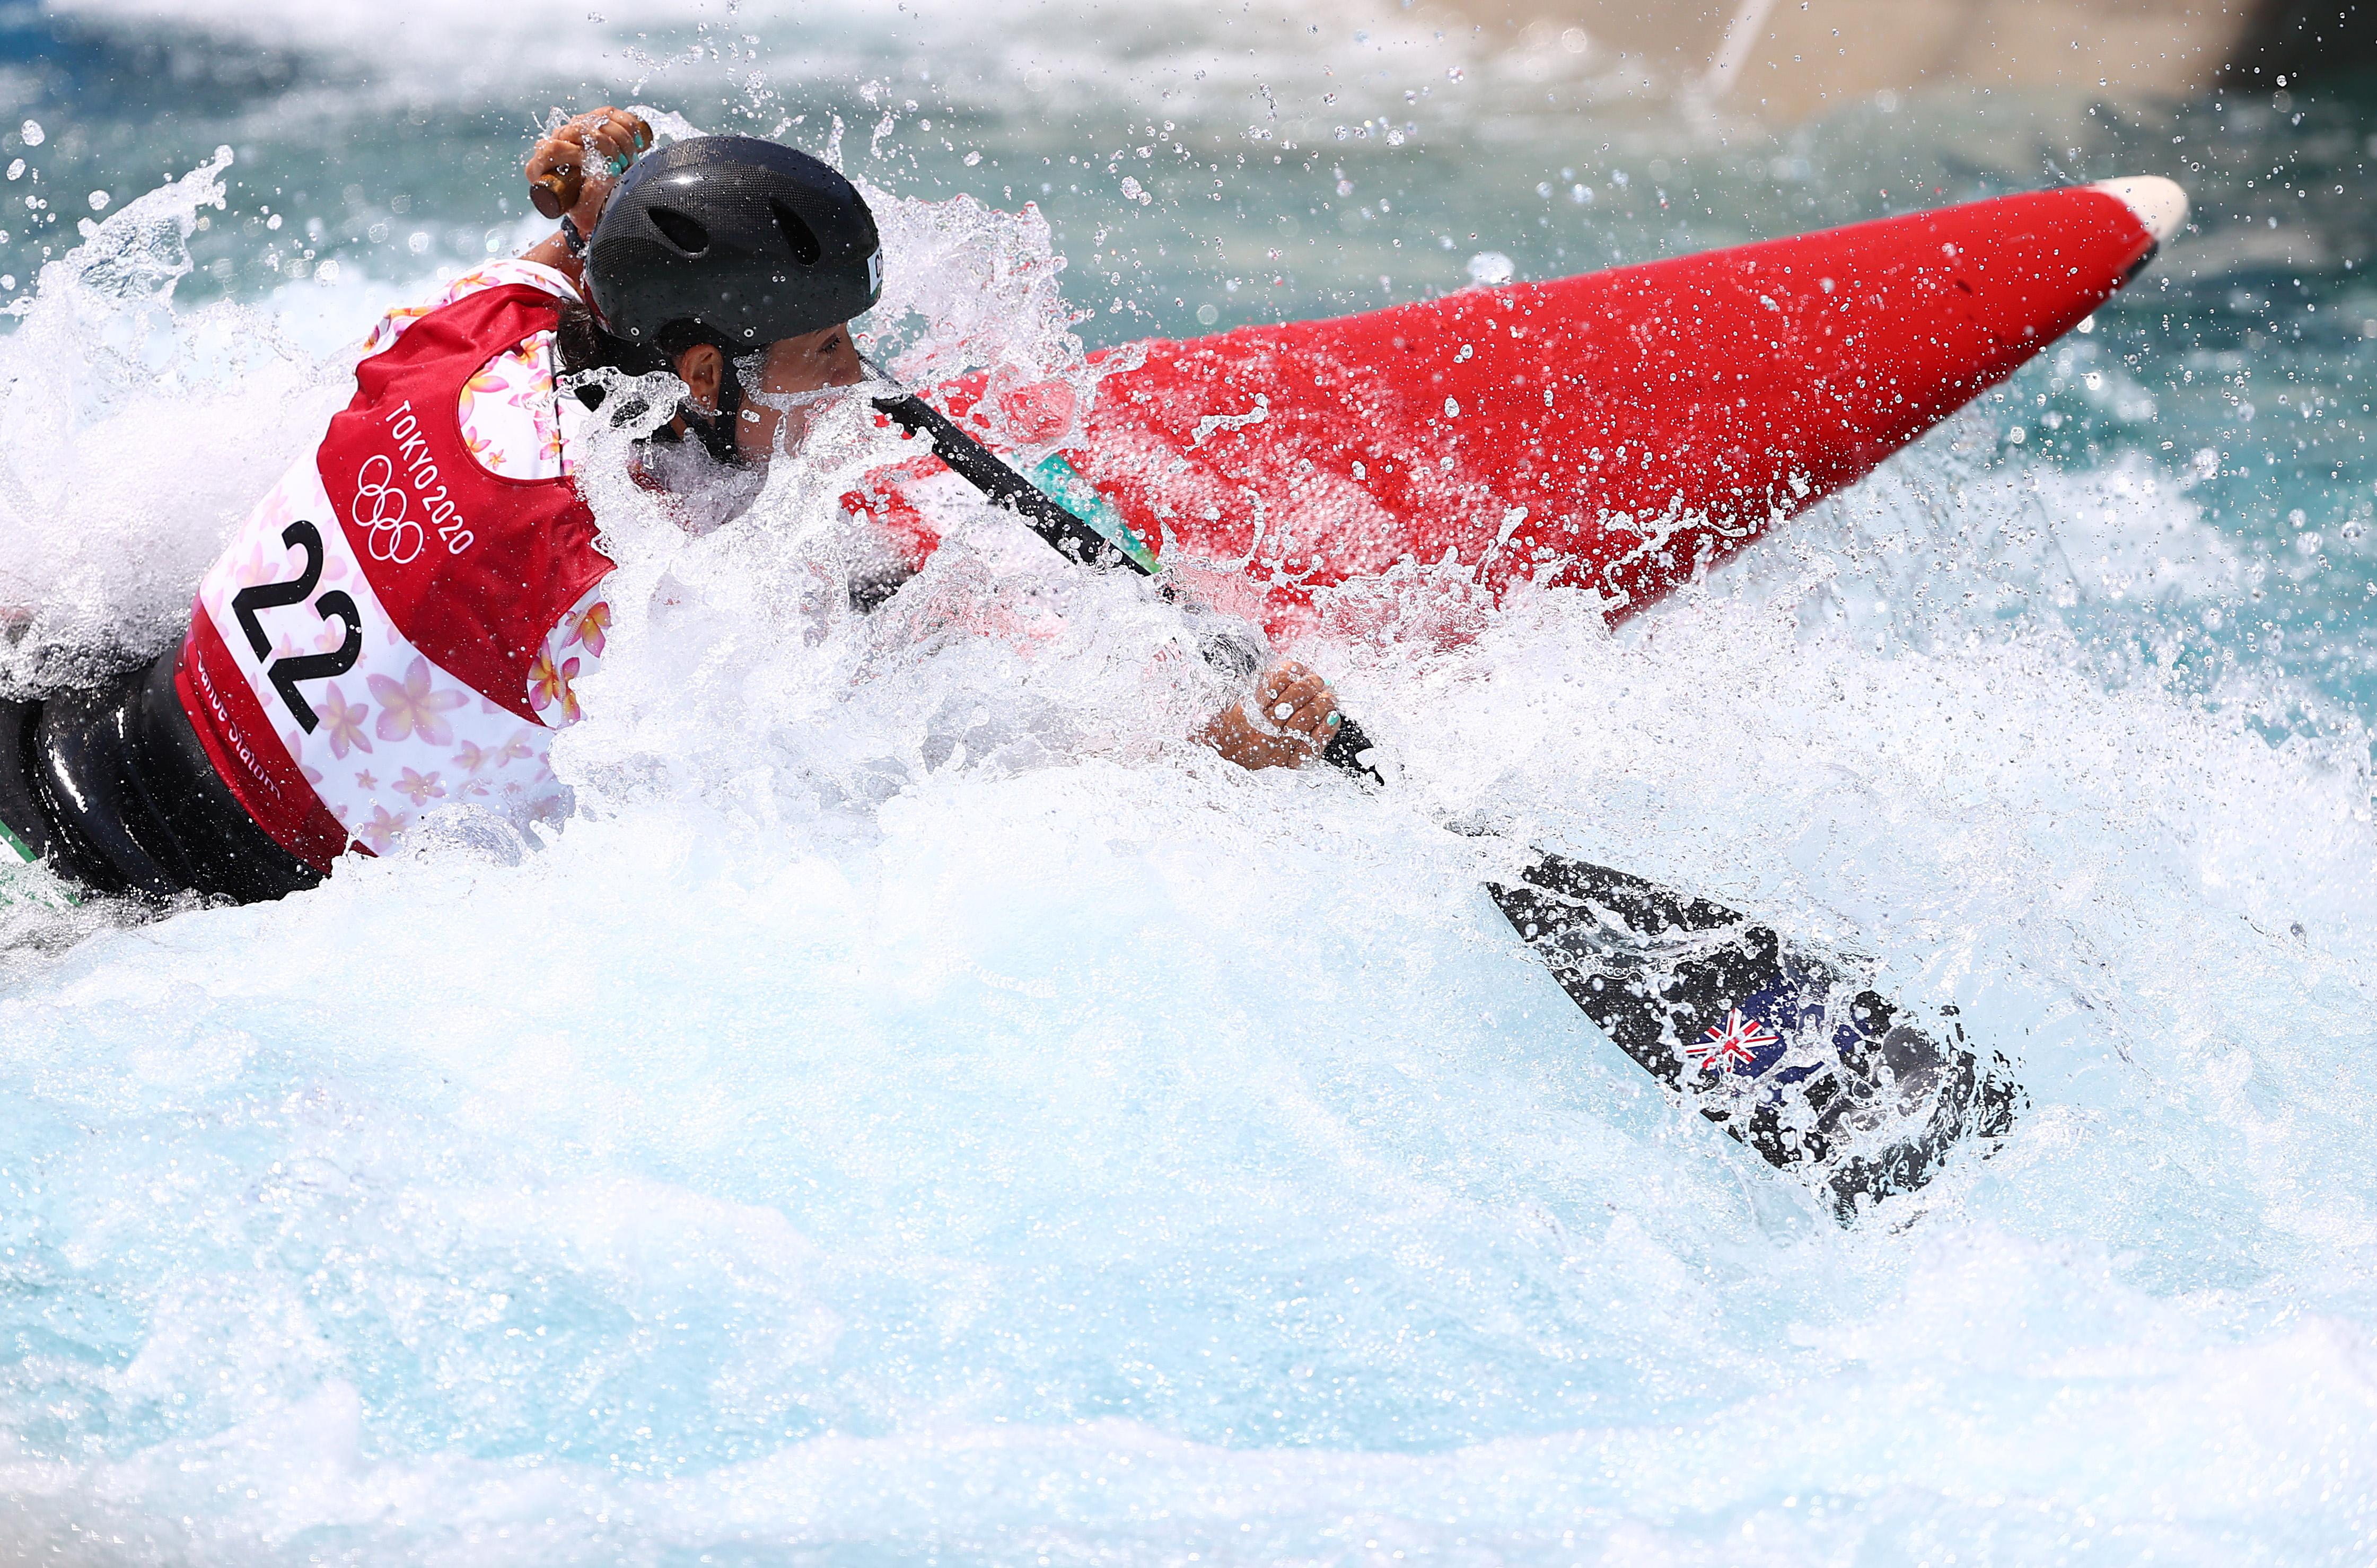 Tokyo 2020 Olympics - Canoe Slalom - Women's C1 - Heats - Kasai Canoe Slalom Centre, Tokyo, Japan - July 28, 2021. Jane Nicholas of the Cook Islands in action REUTERS/Stoyan Nenov